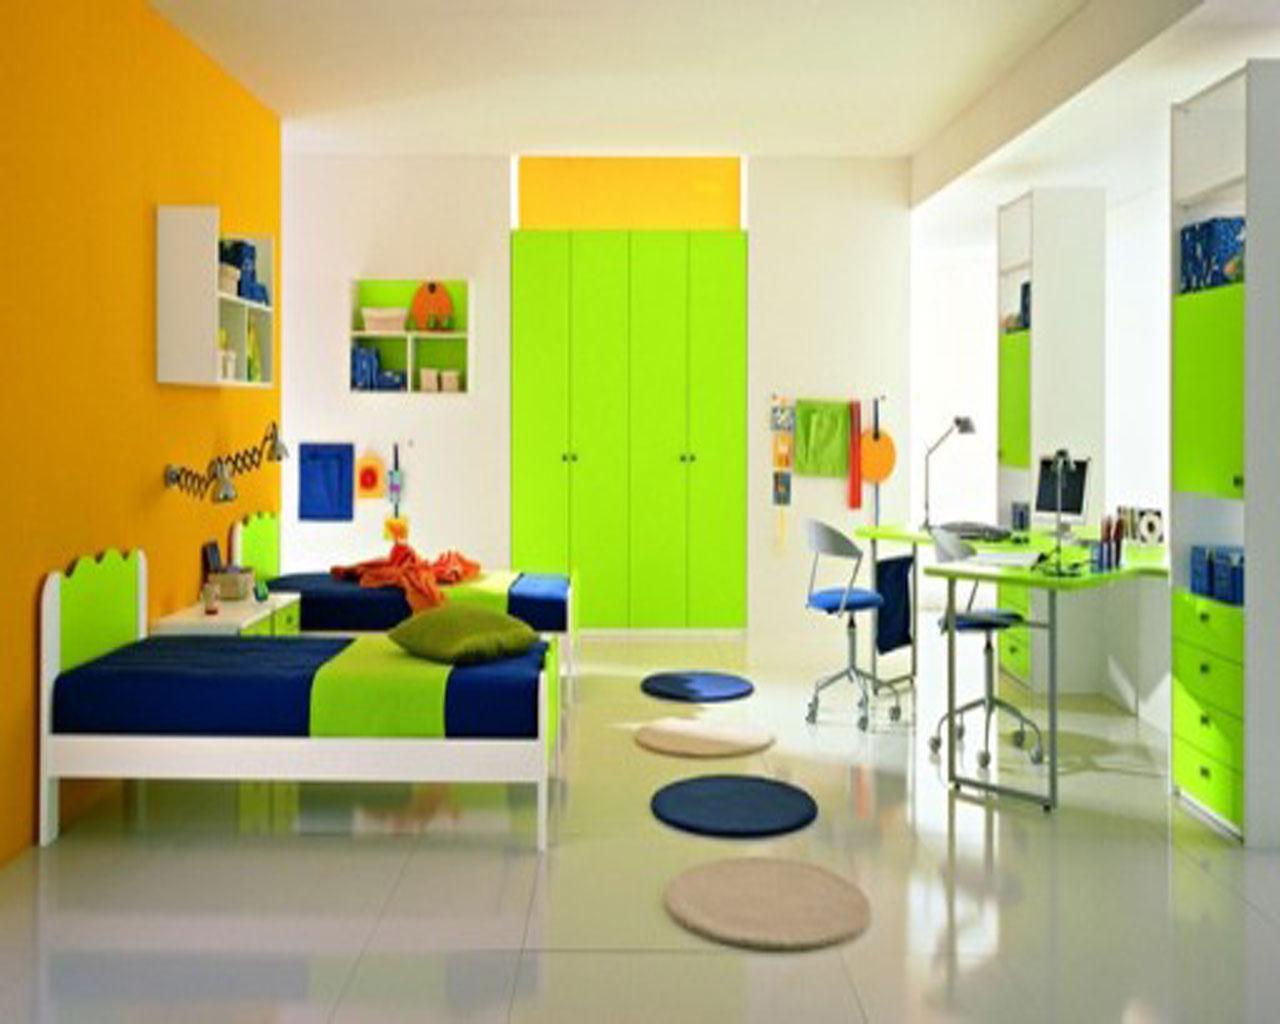 Tips To Designing Your Children's Room | ToLet Insider